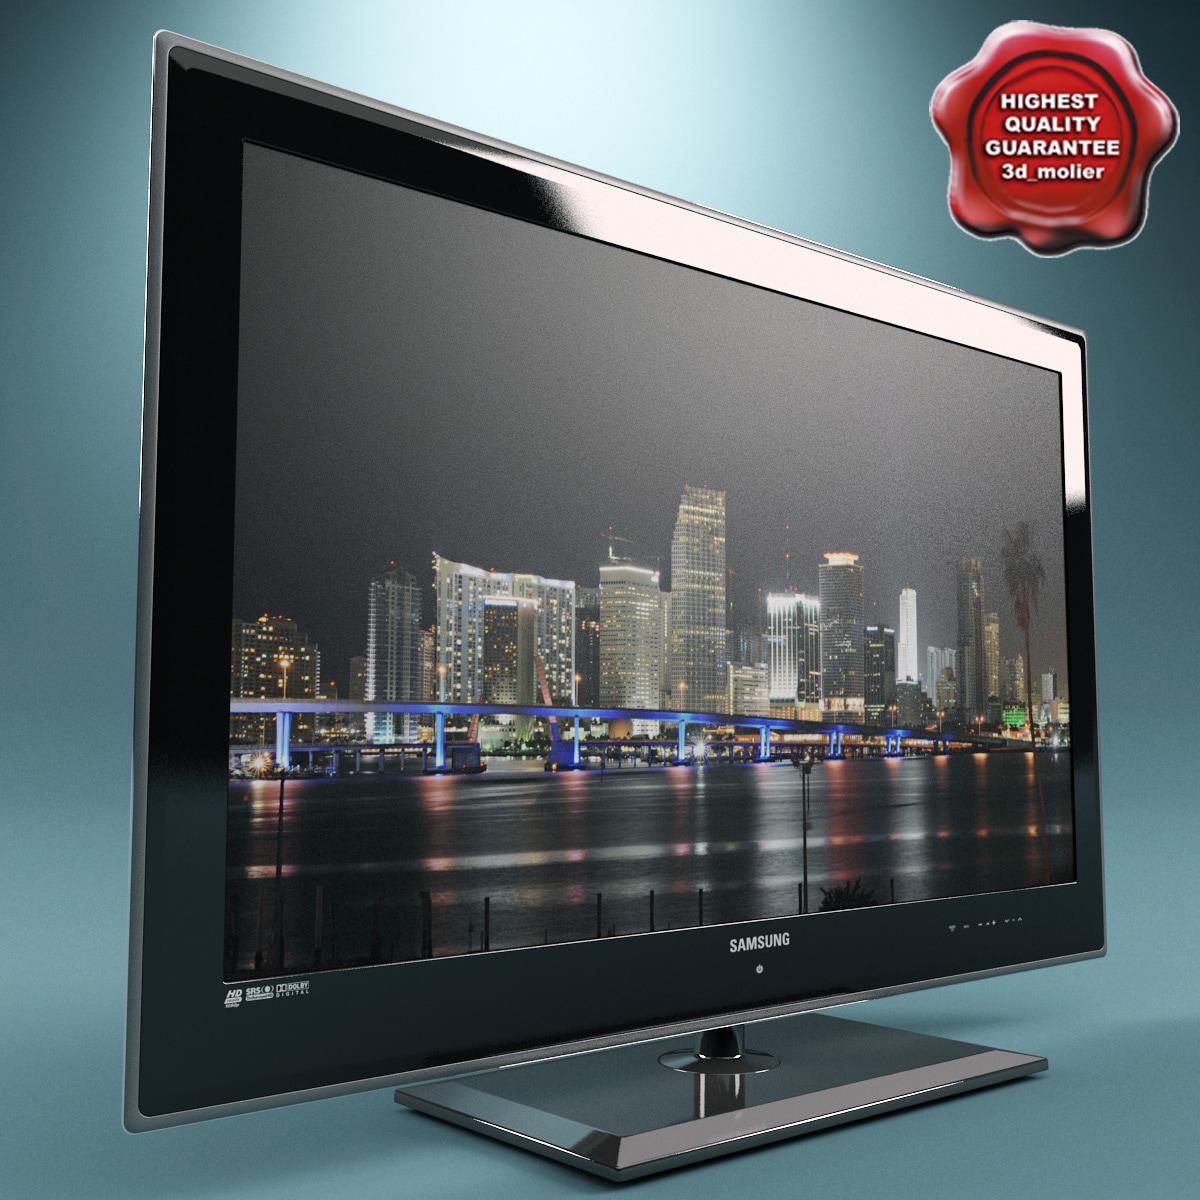 LCD_TV_Samsung_UE40B7090_00.jpg